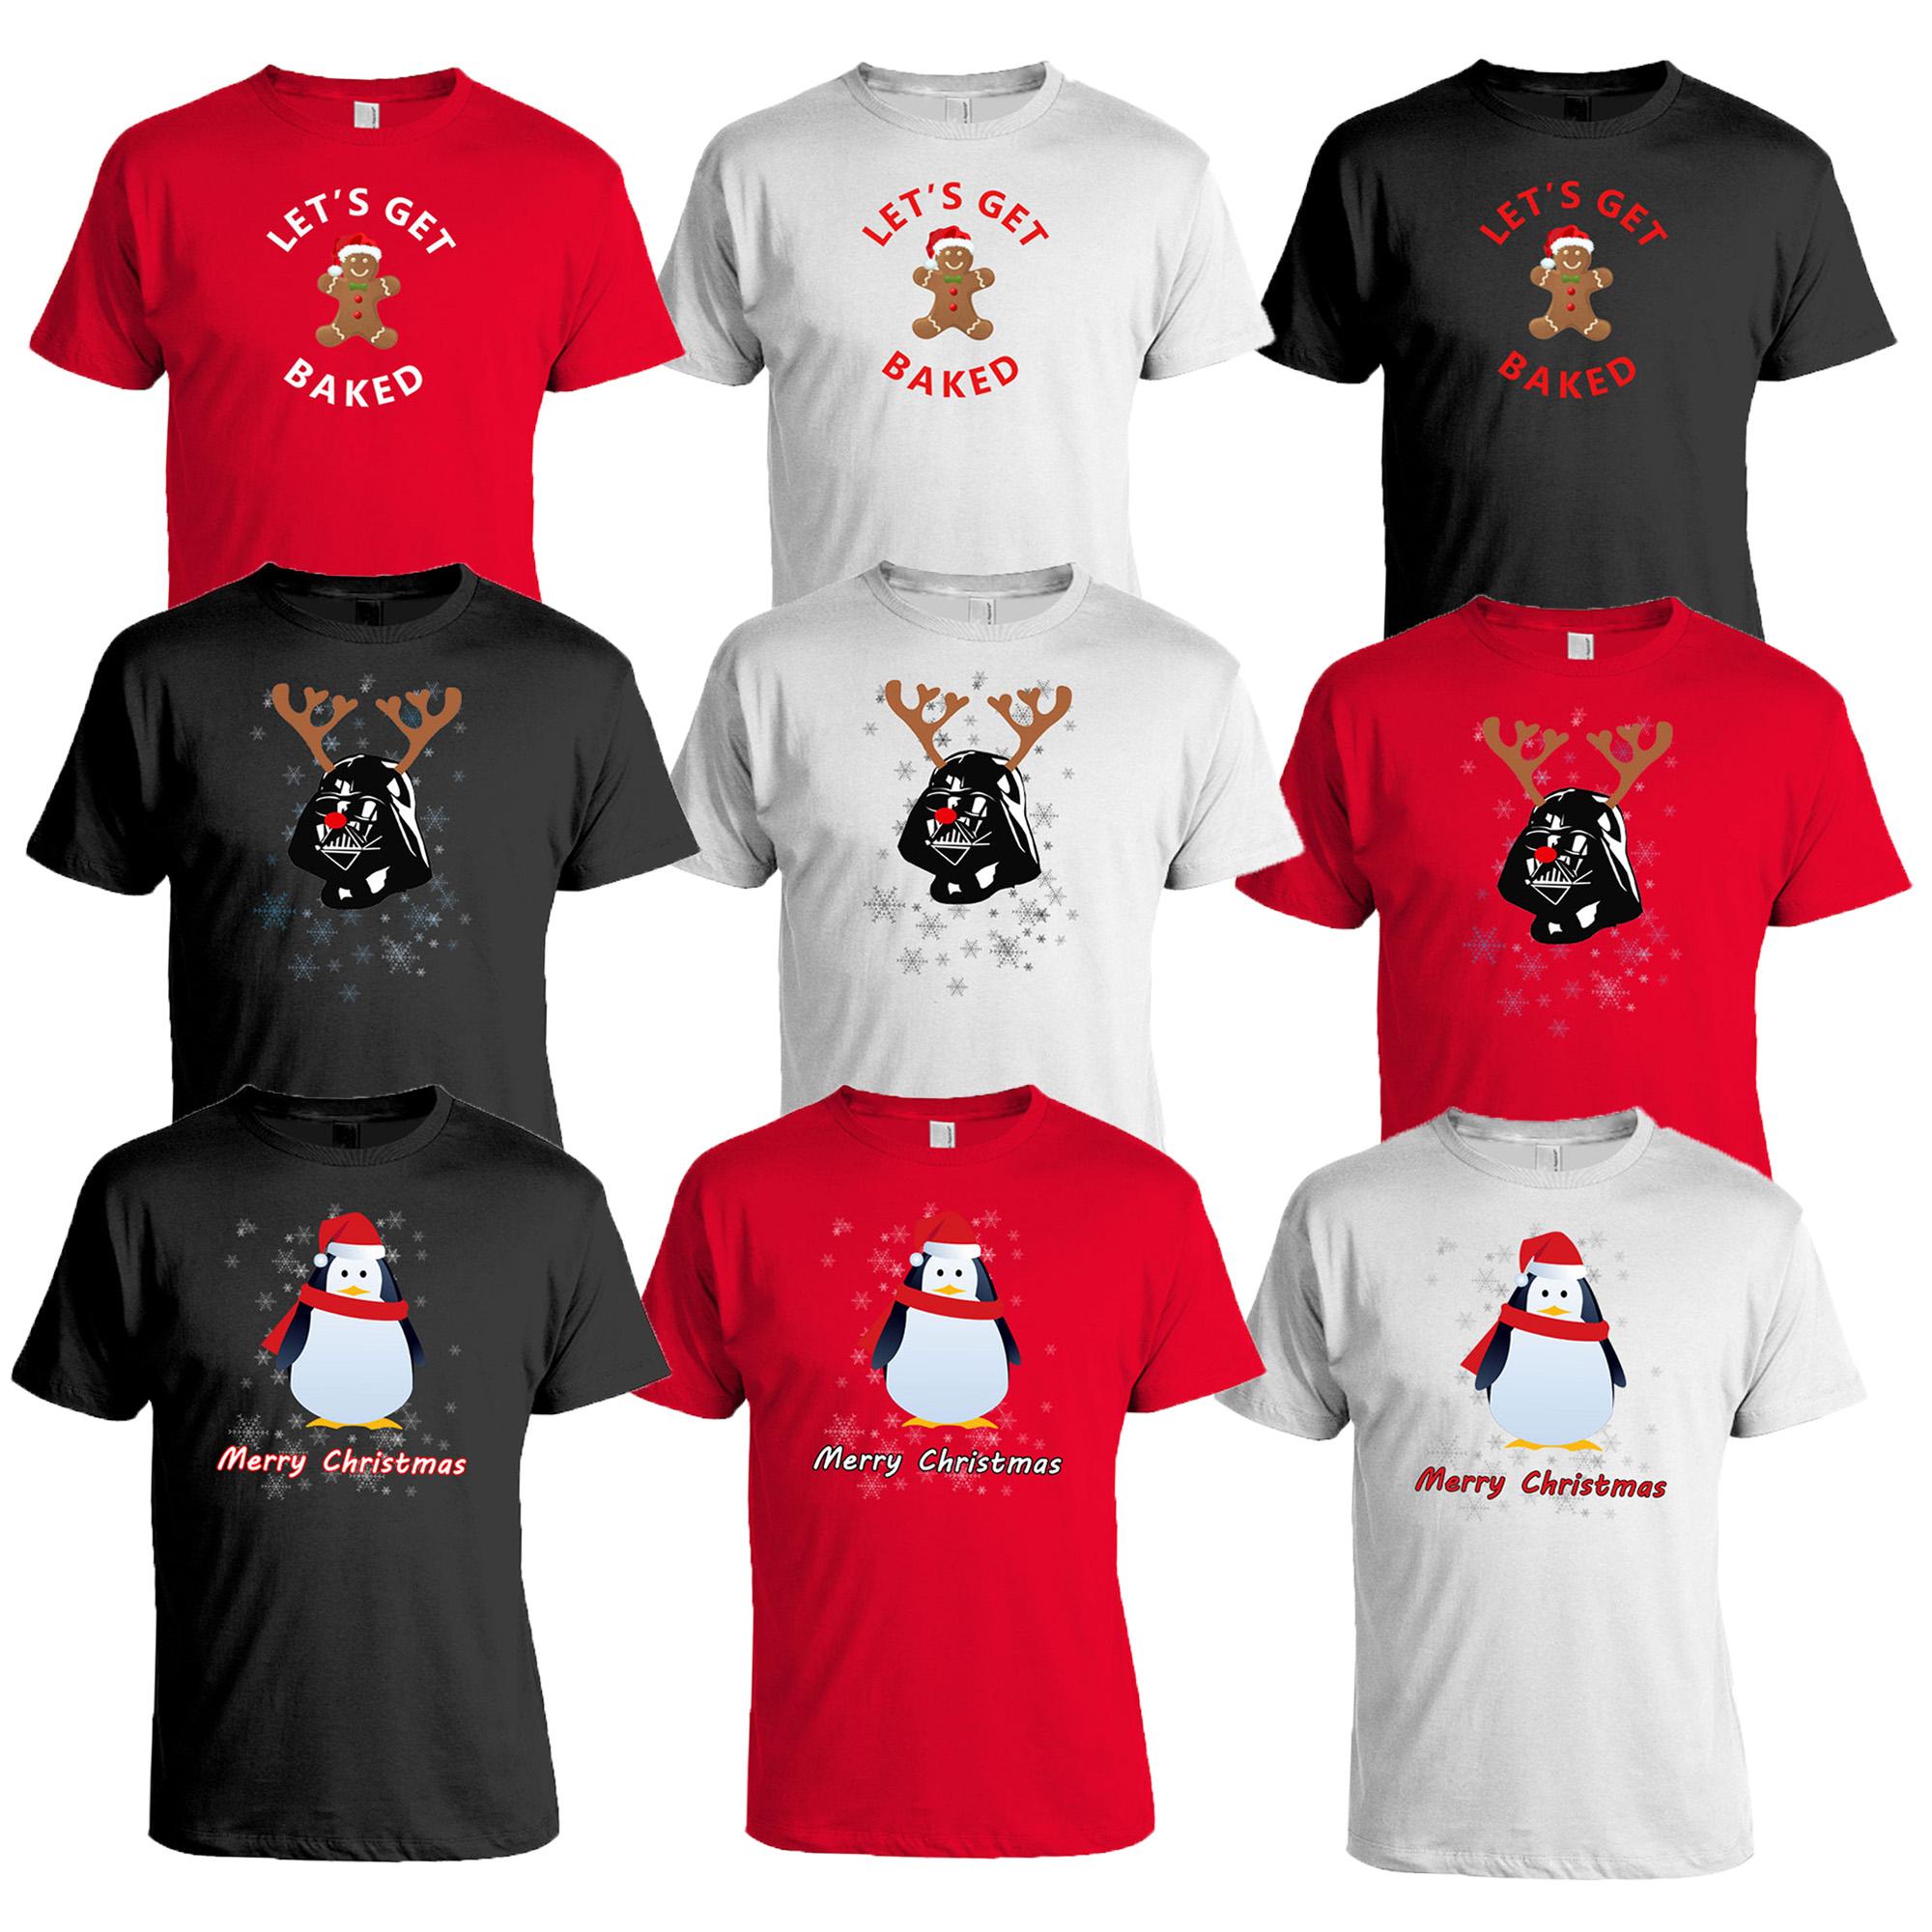 Happy Christmas Cookie Mens Kids T-Shirt Reindeer Xmas Festive Novelty T Shirt